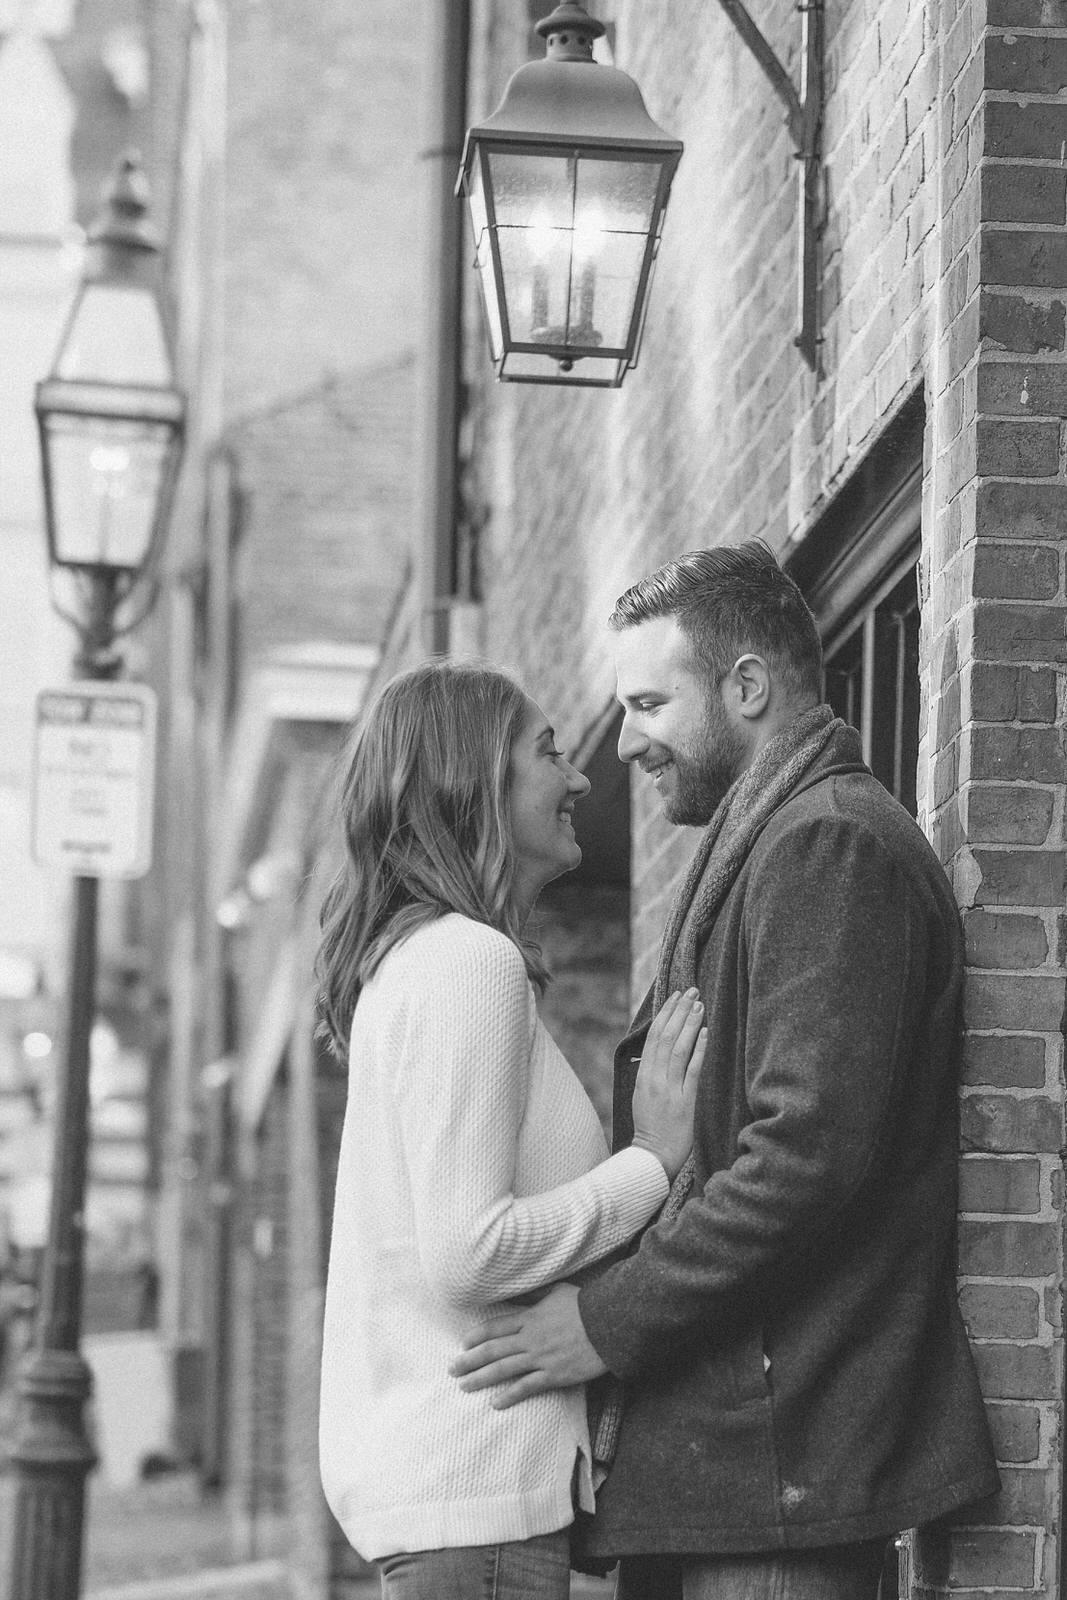 candid-boston-engagement-photography-beacon-hill-252.jpg